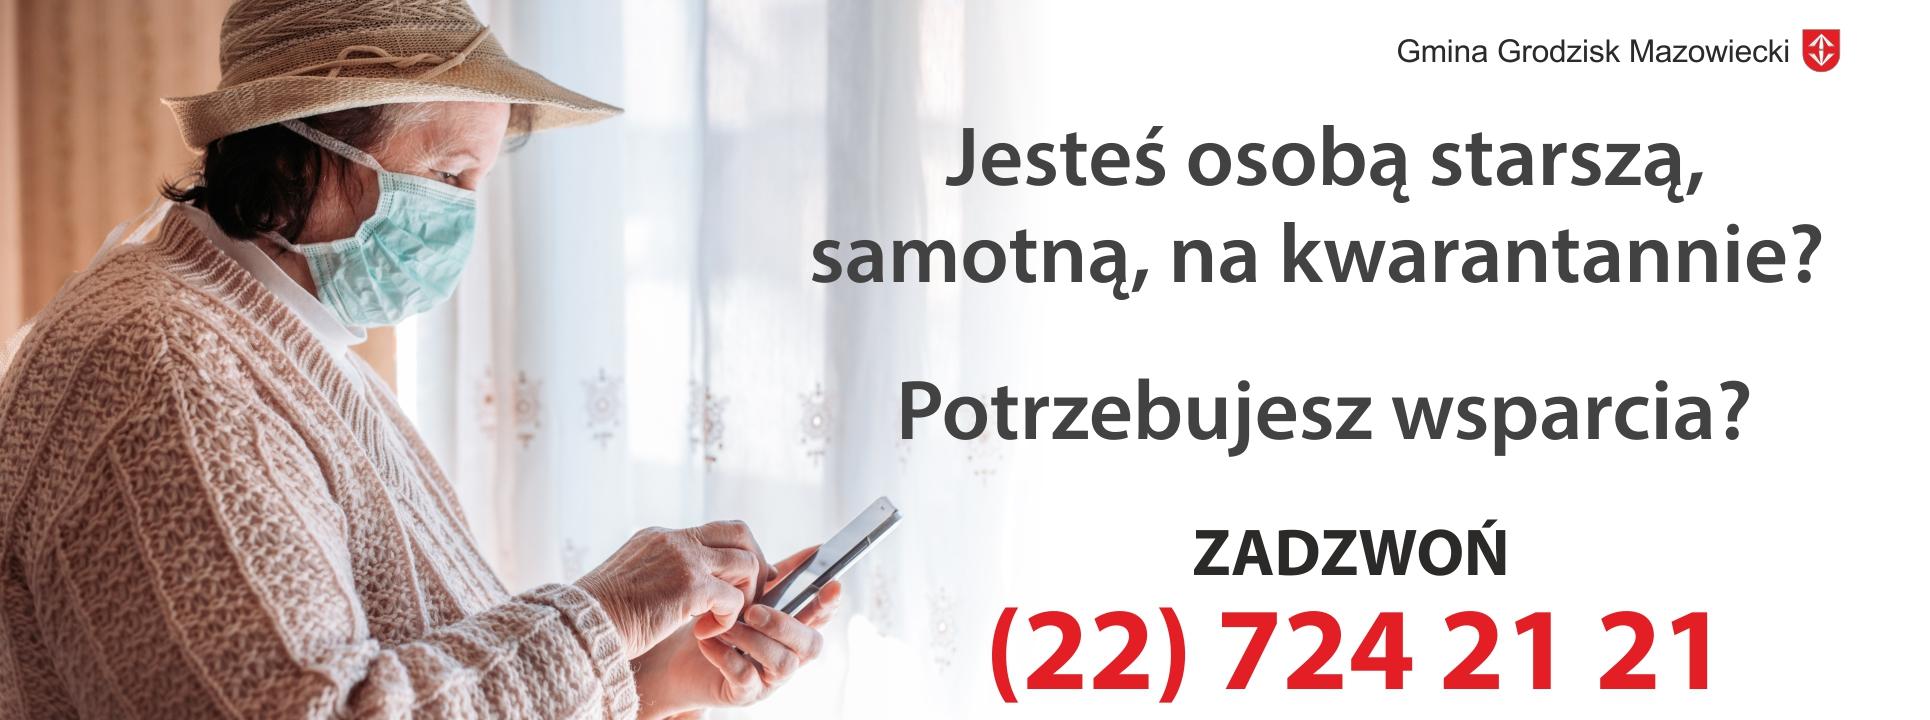 telefon wsparcia 22 724 21 21